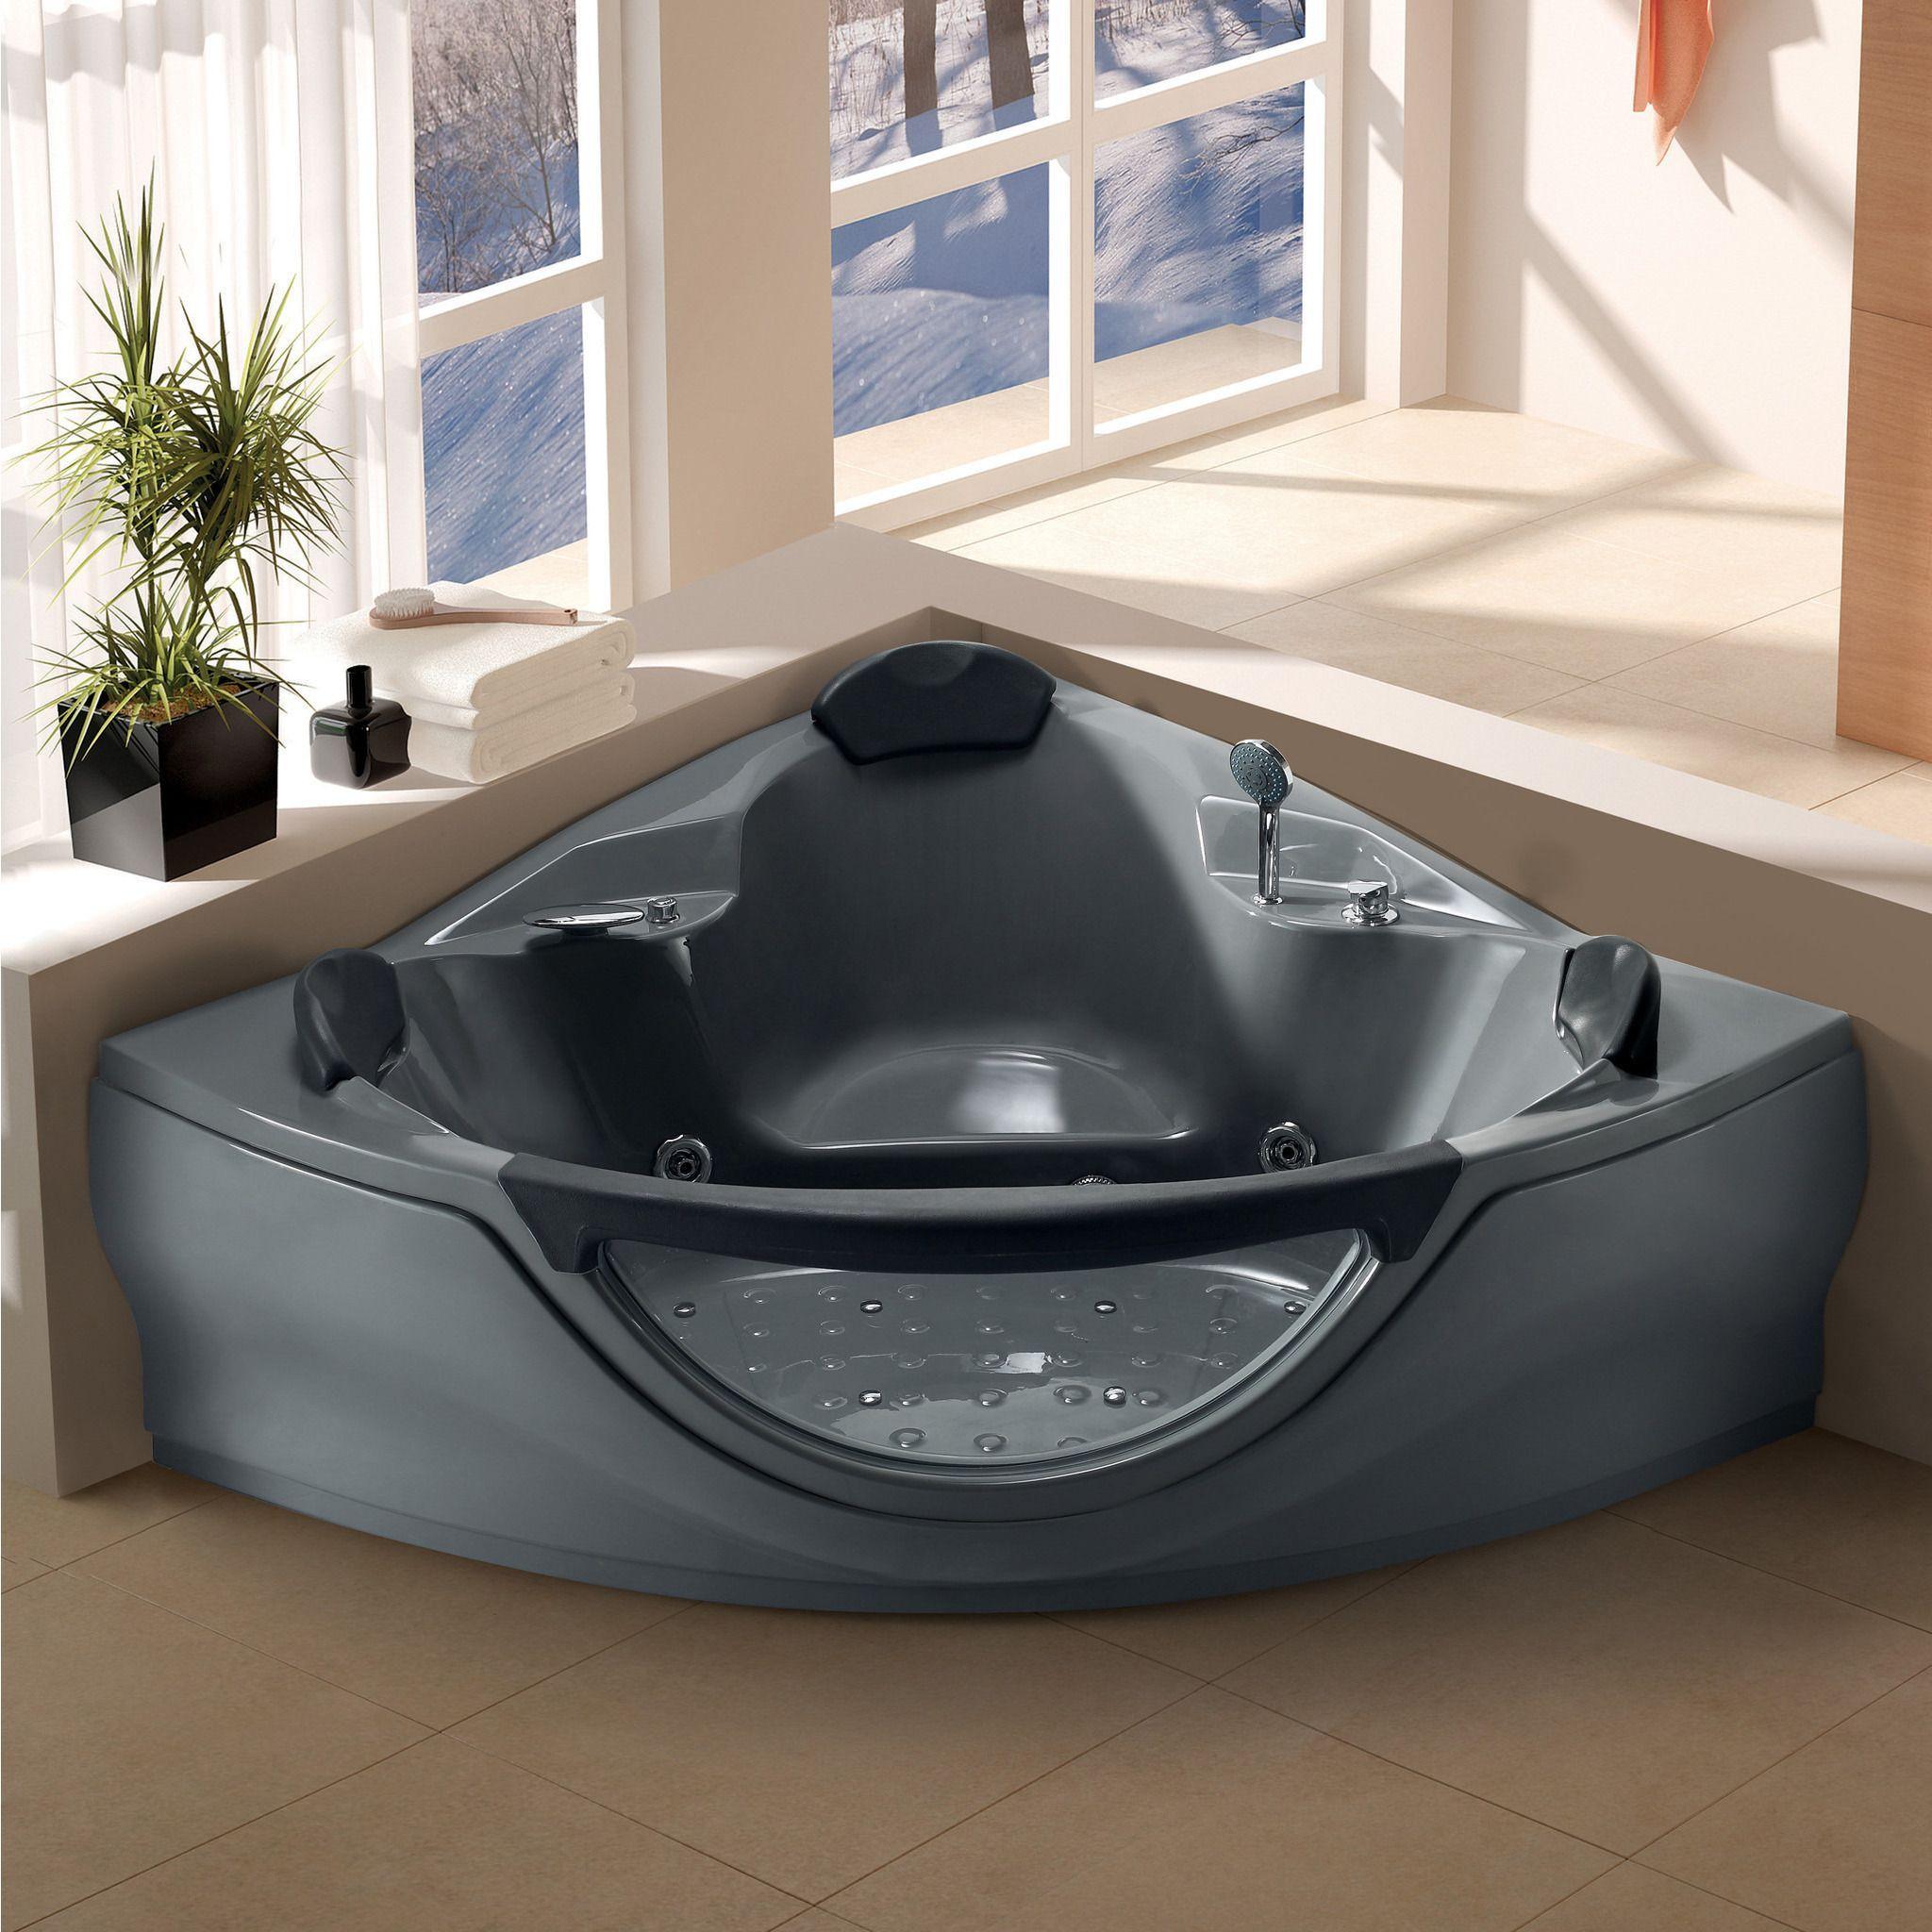 Maya Bath Venezia-Grey 5\' 3-seater Corner Acrylic Whirlpool Bathtub ...